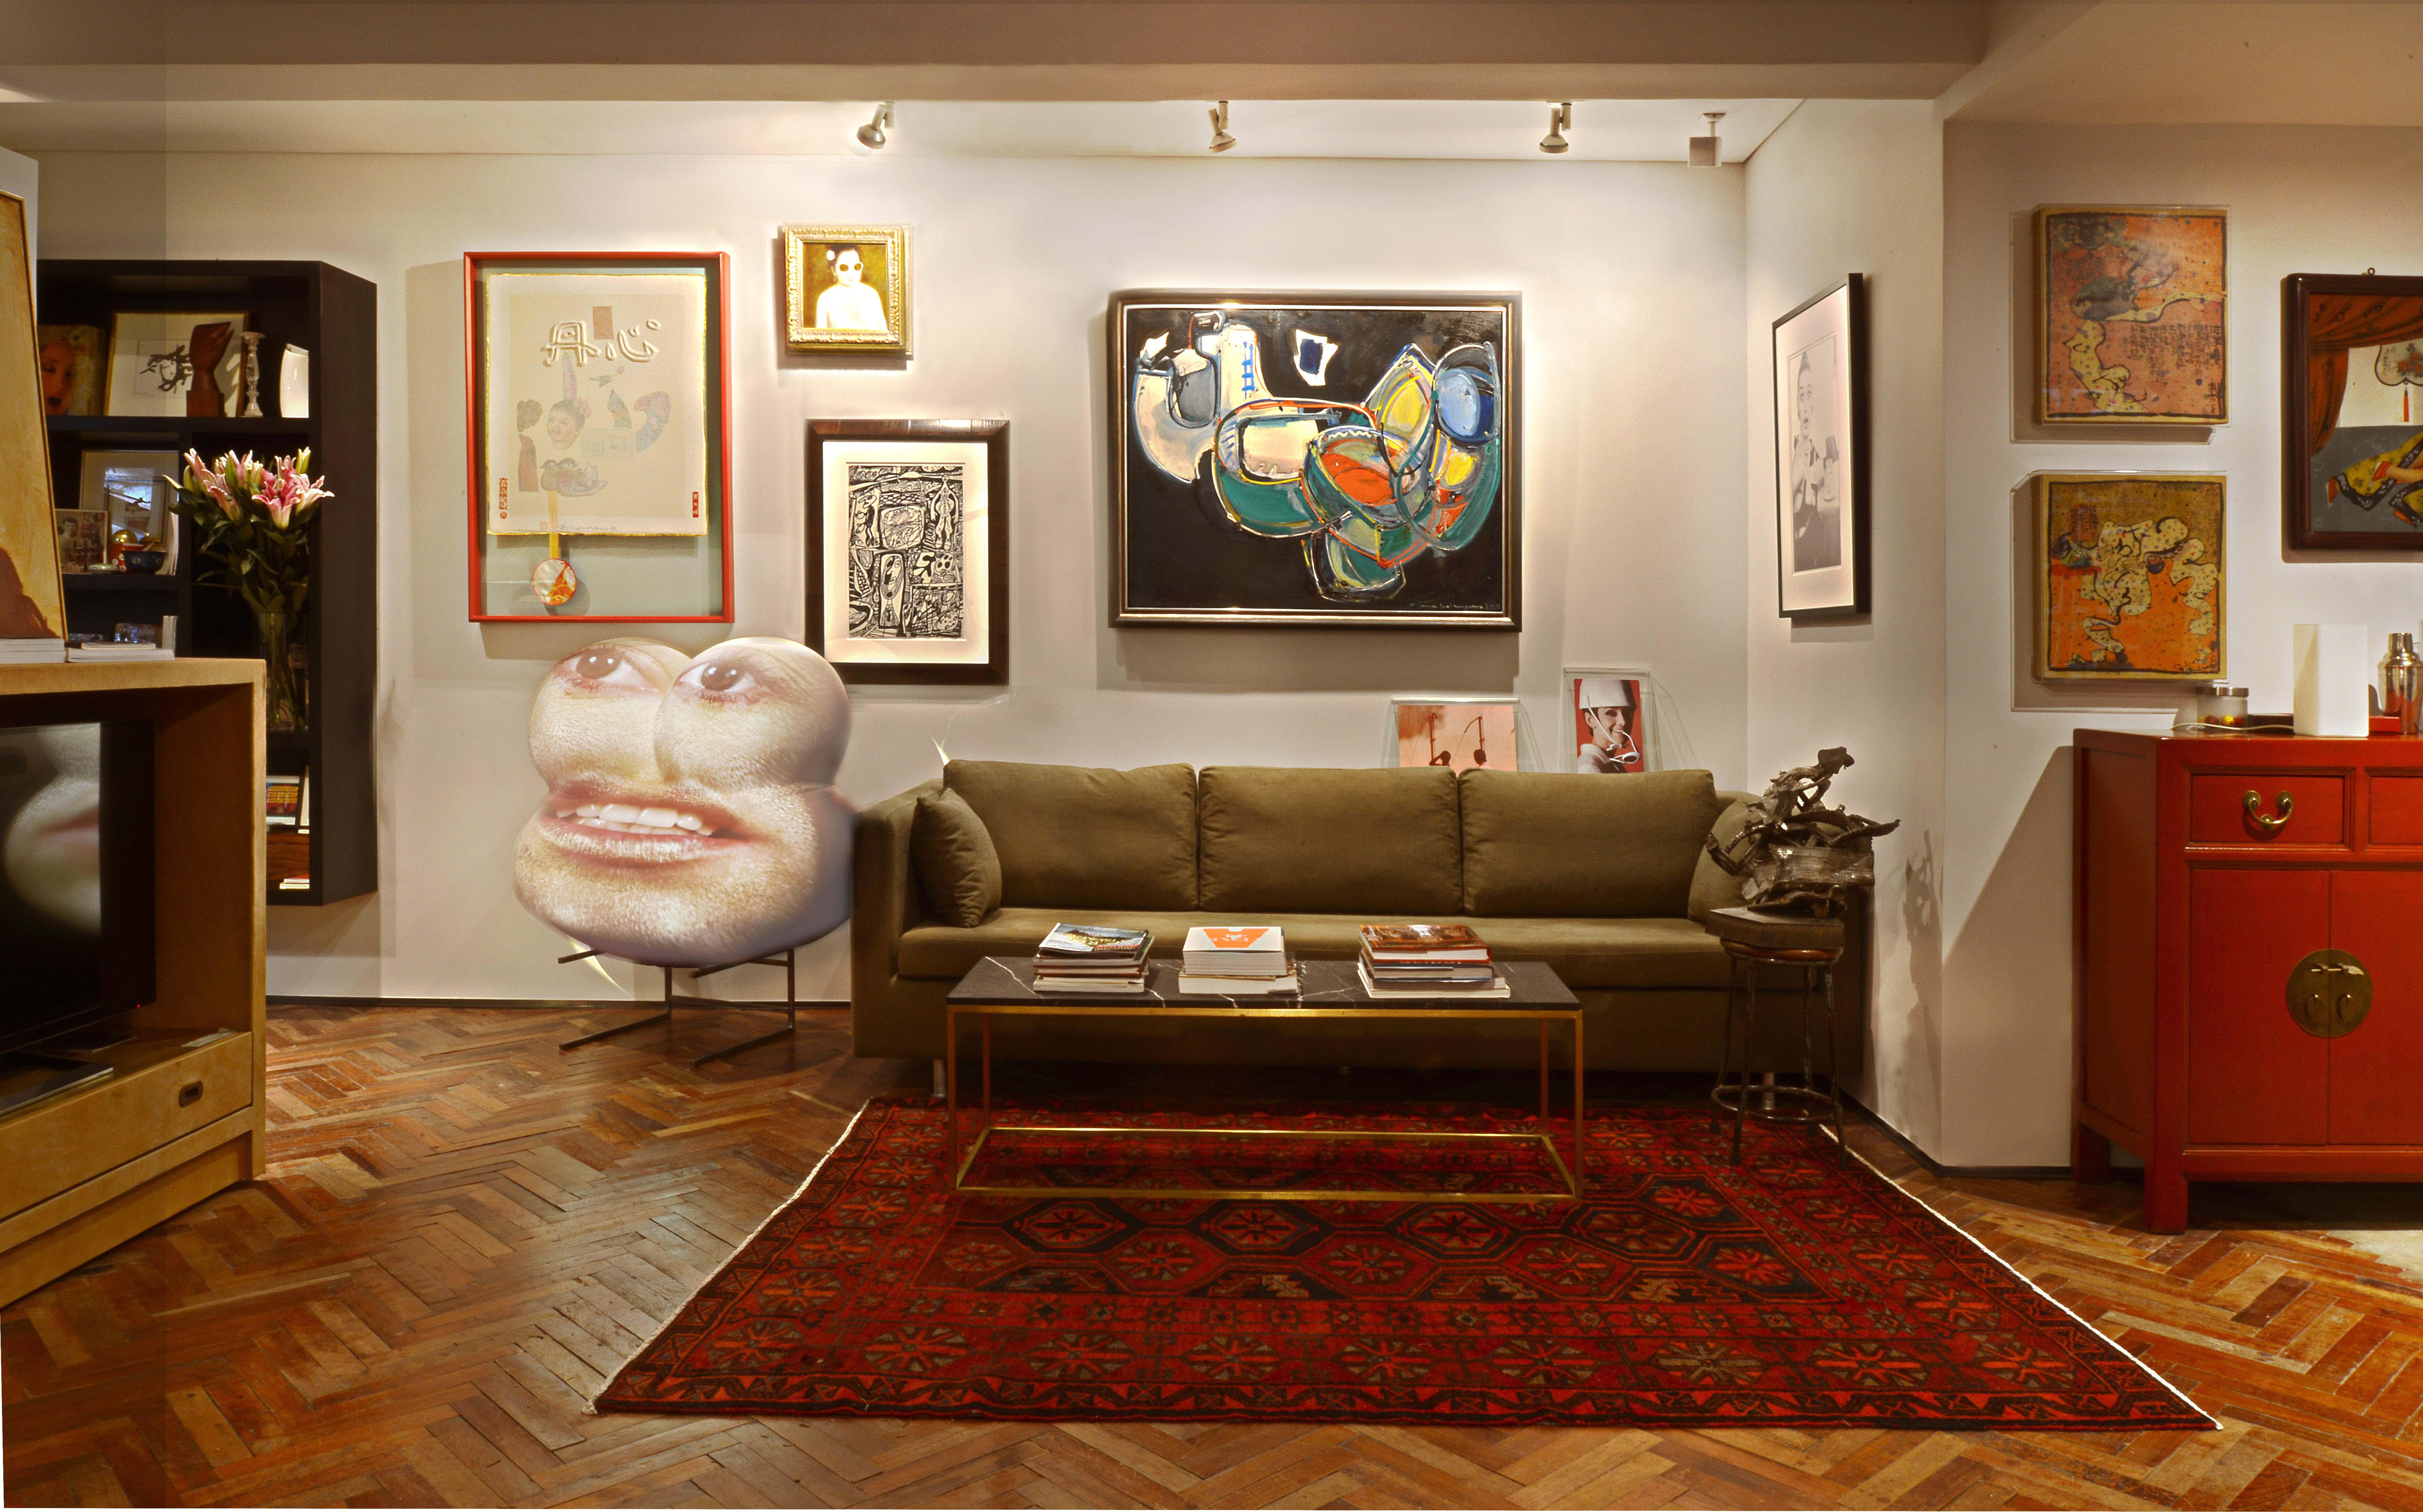 Stefano Tordiglione Design - Leong Fee Terrace 23